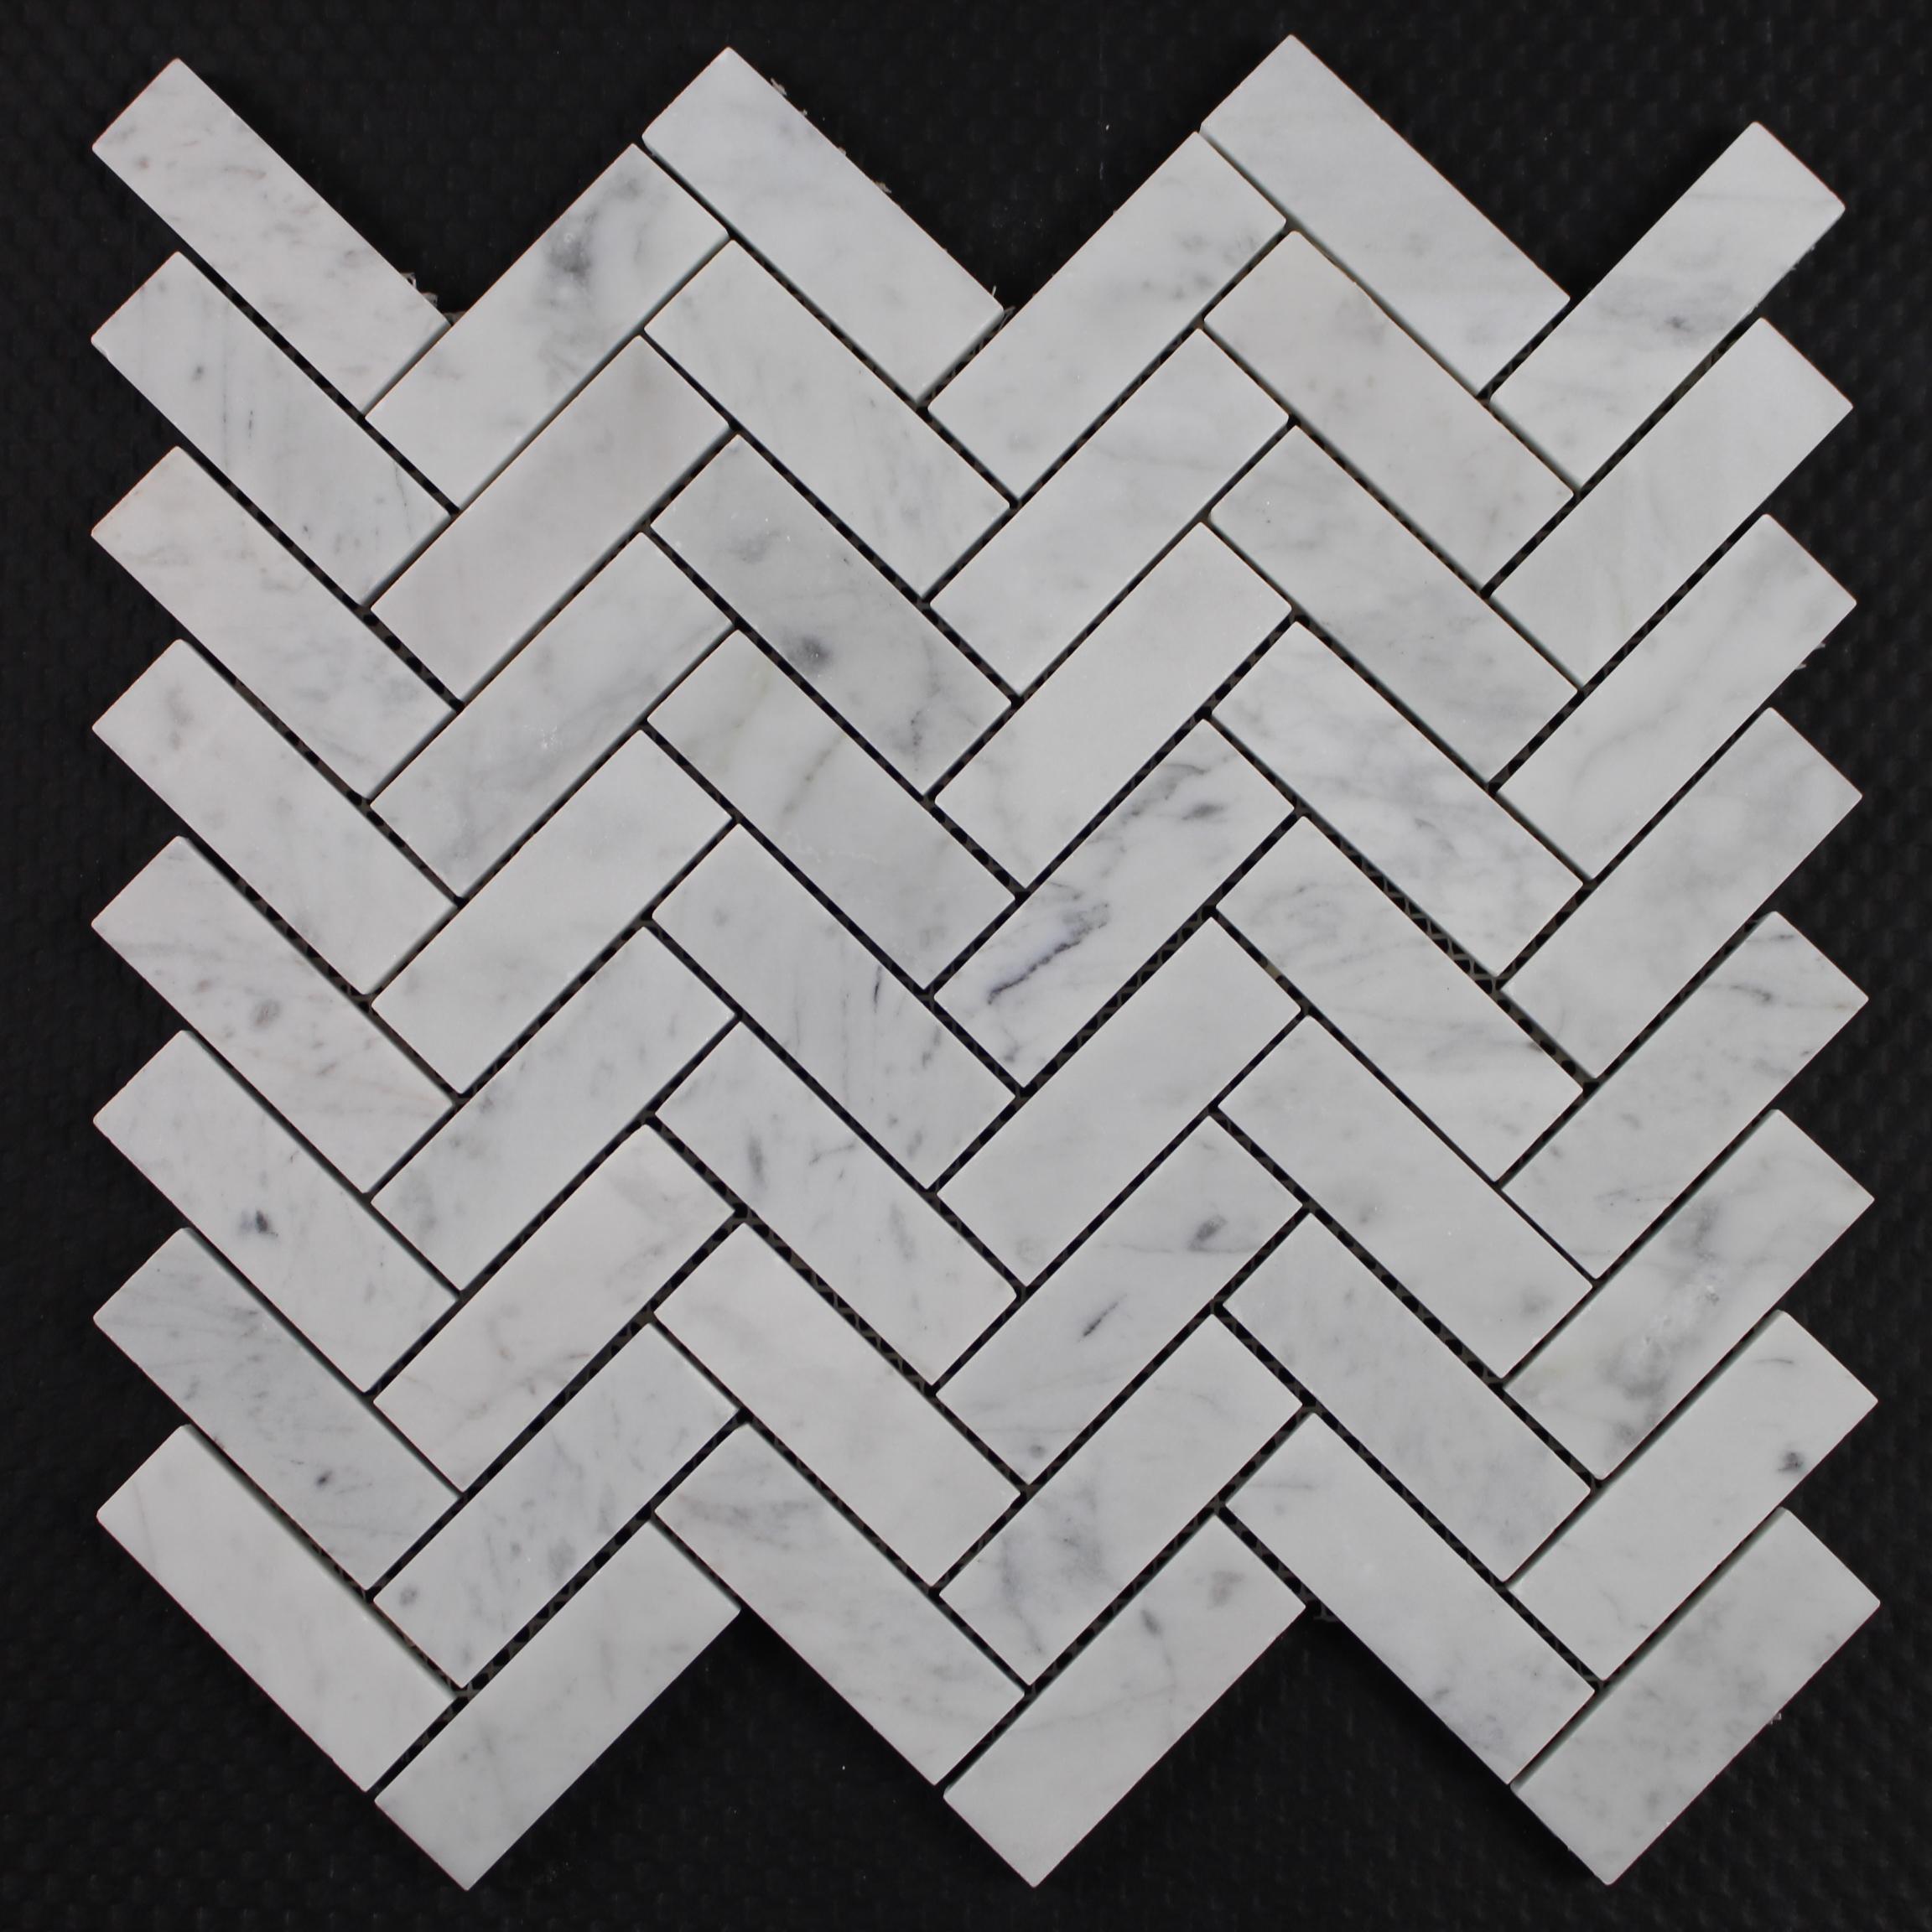 carrara wei mosaik marmor fischgr t backsplash fliesen. Black Bedroom Furniture Sets. Home Design Ideas